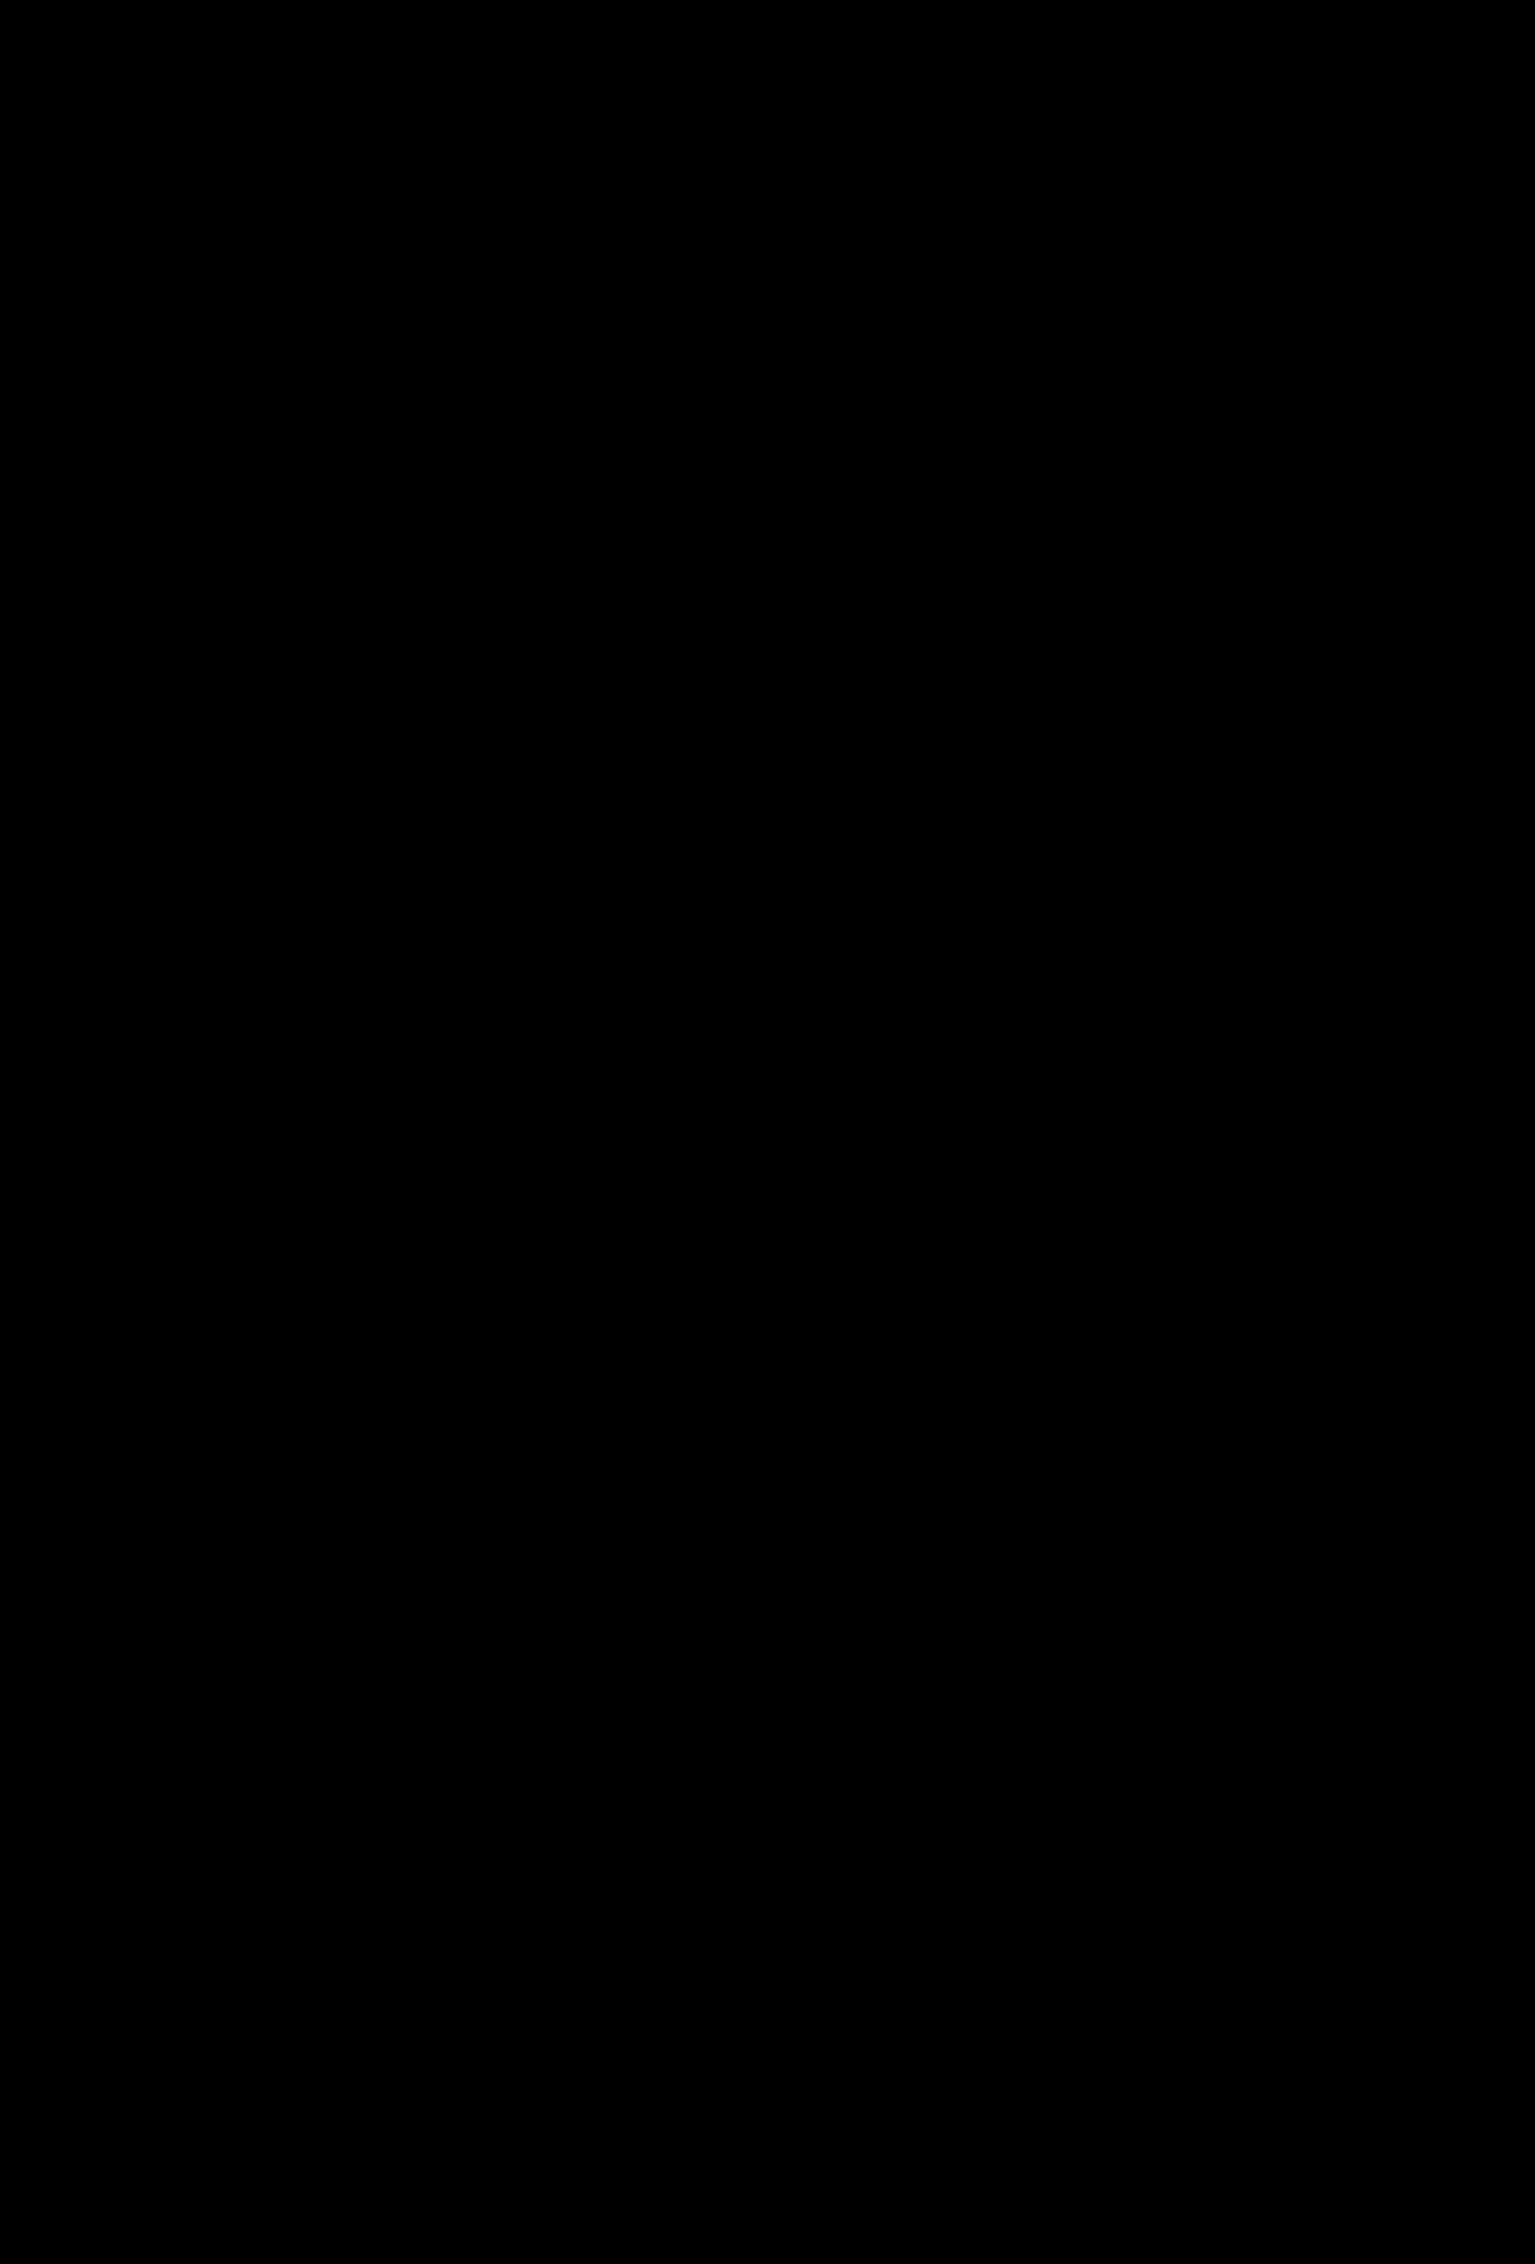 1535x2264 Clipart